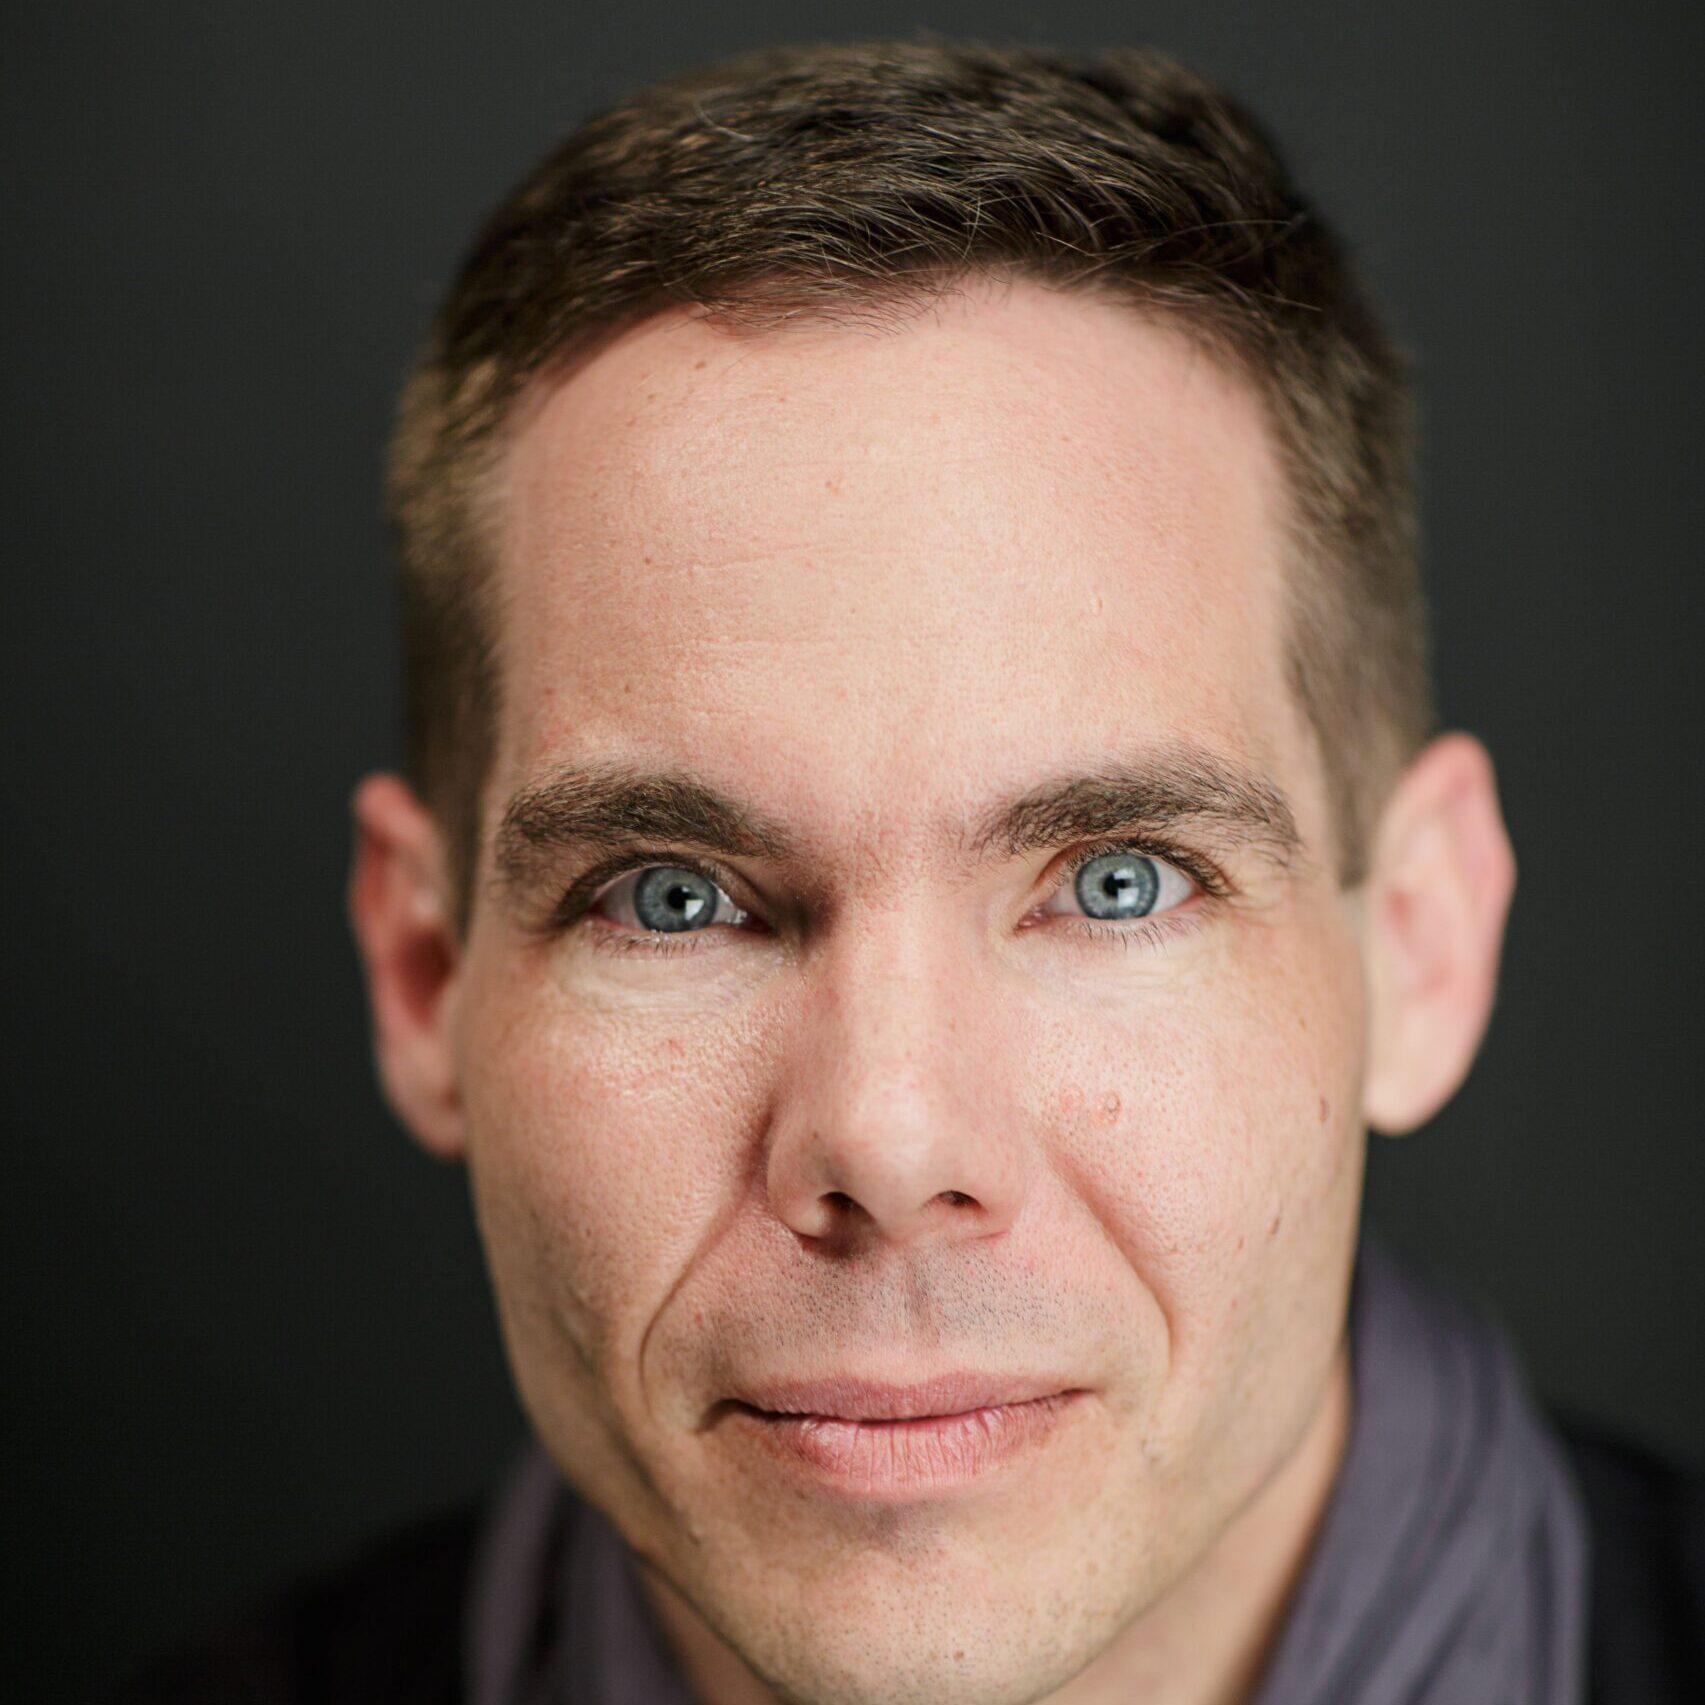 Volker Helzle